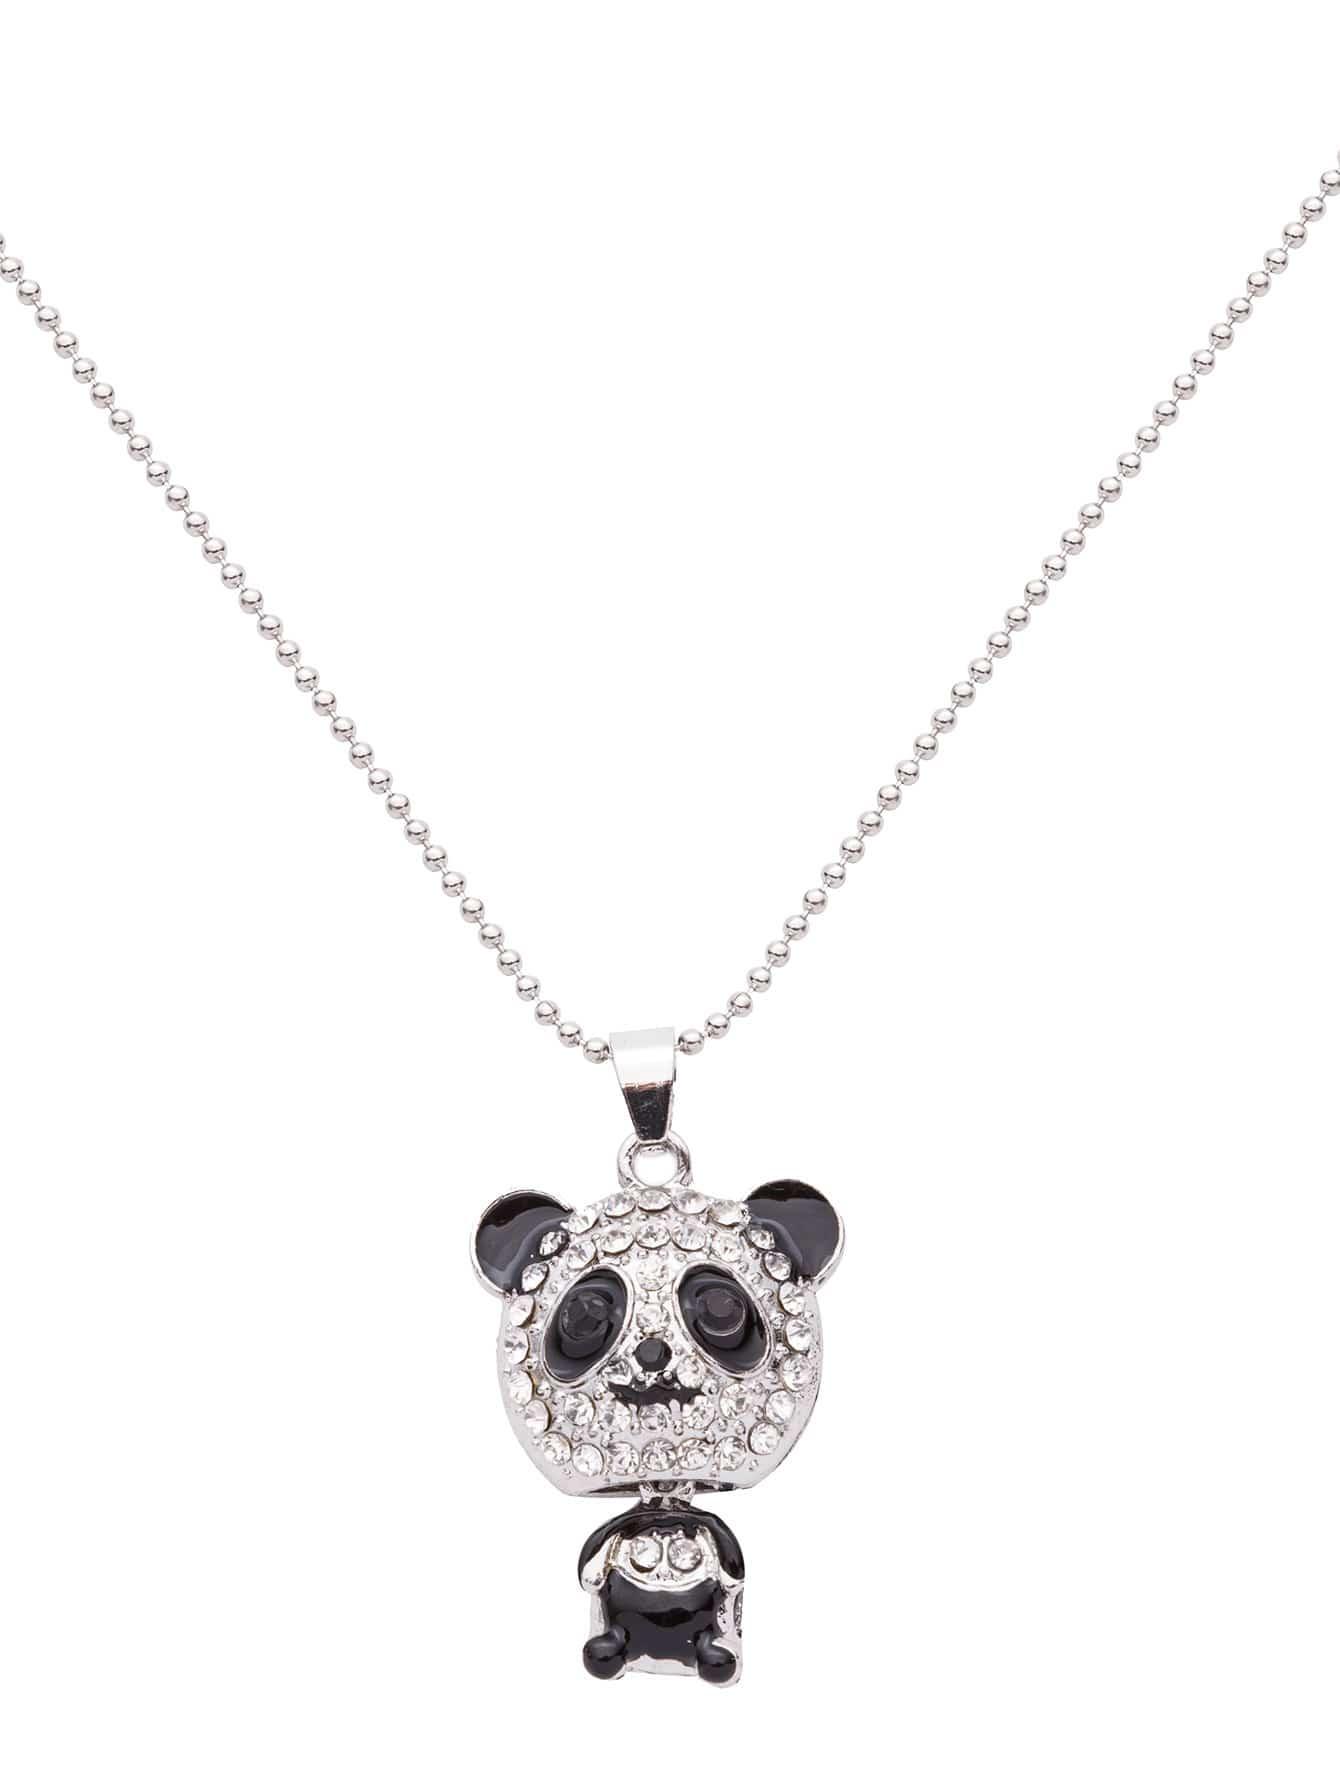 Silver Plated Rhinestone Panda Pendant Necklace